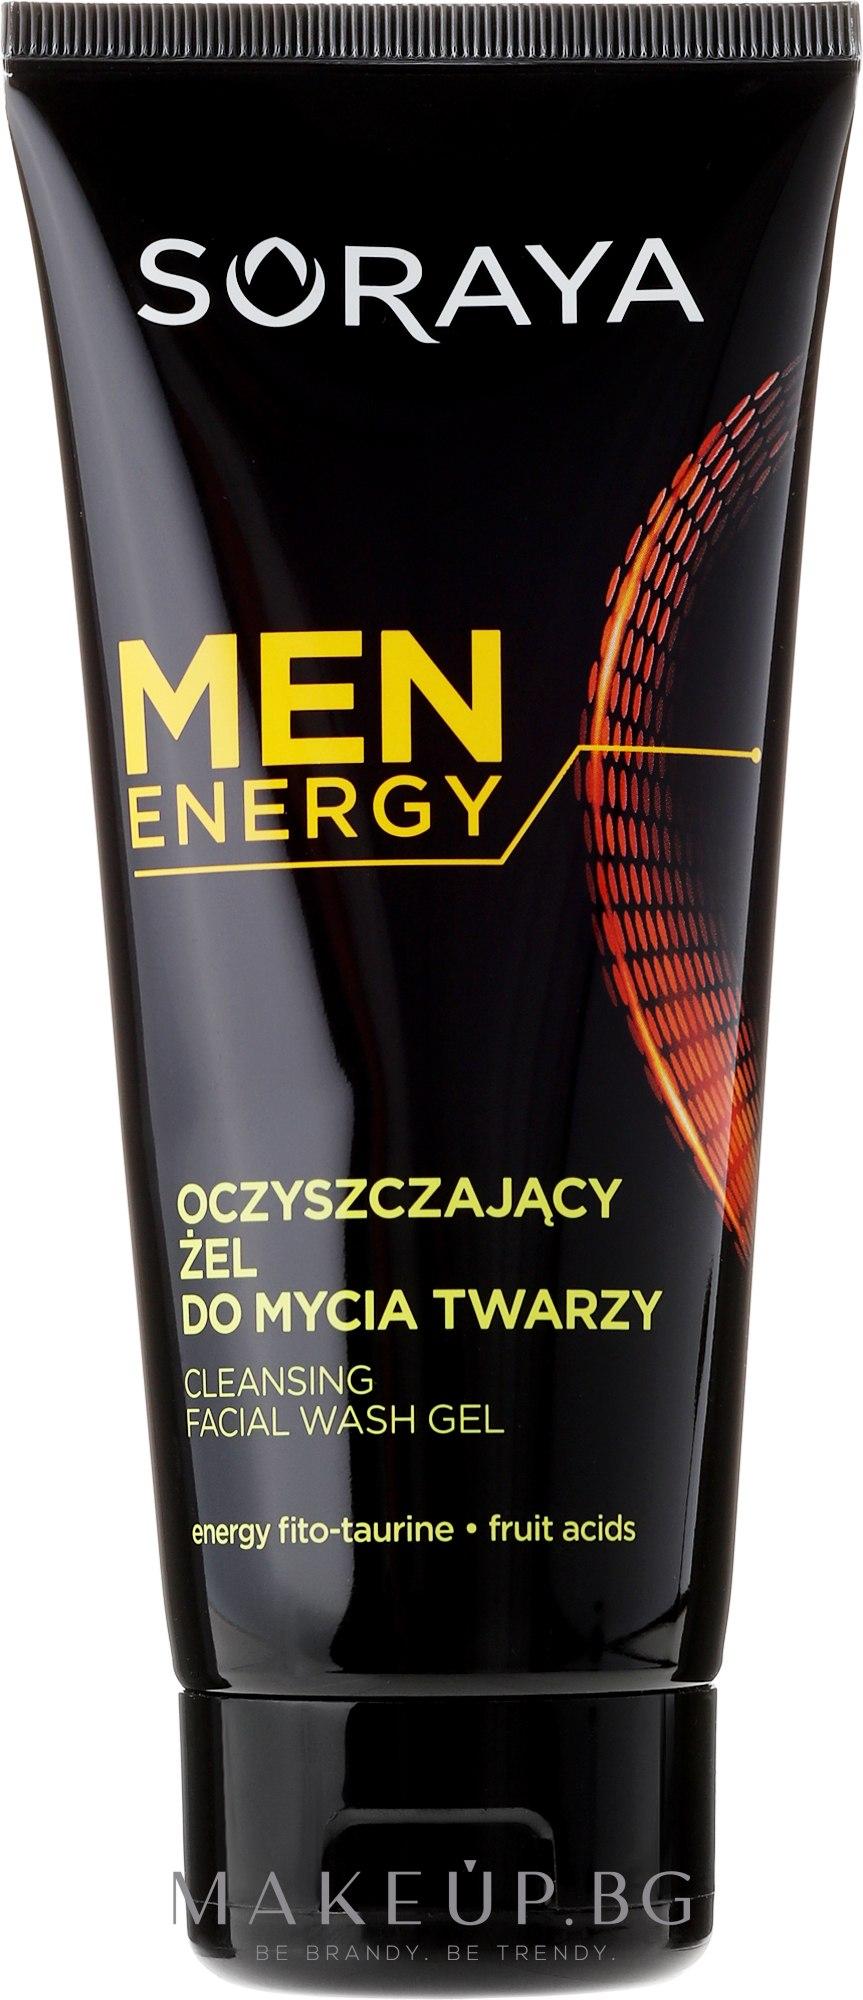 Почистващ гел за лице - Soraya Men Energy — снимка 150 g